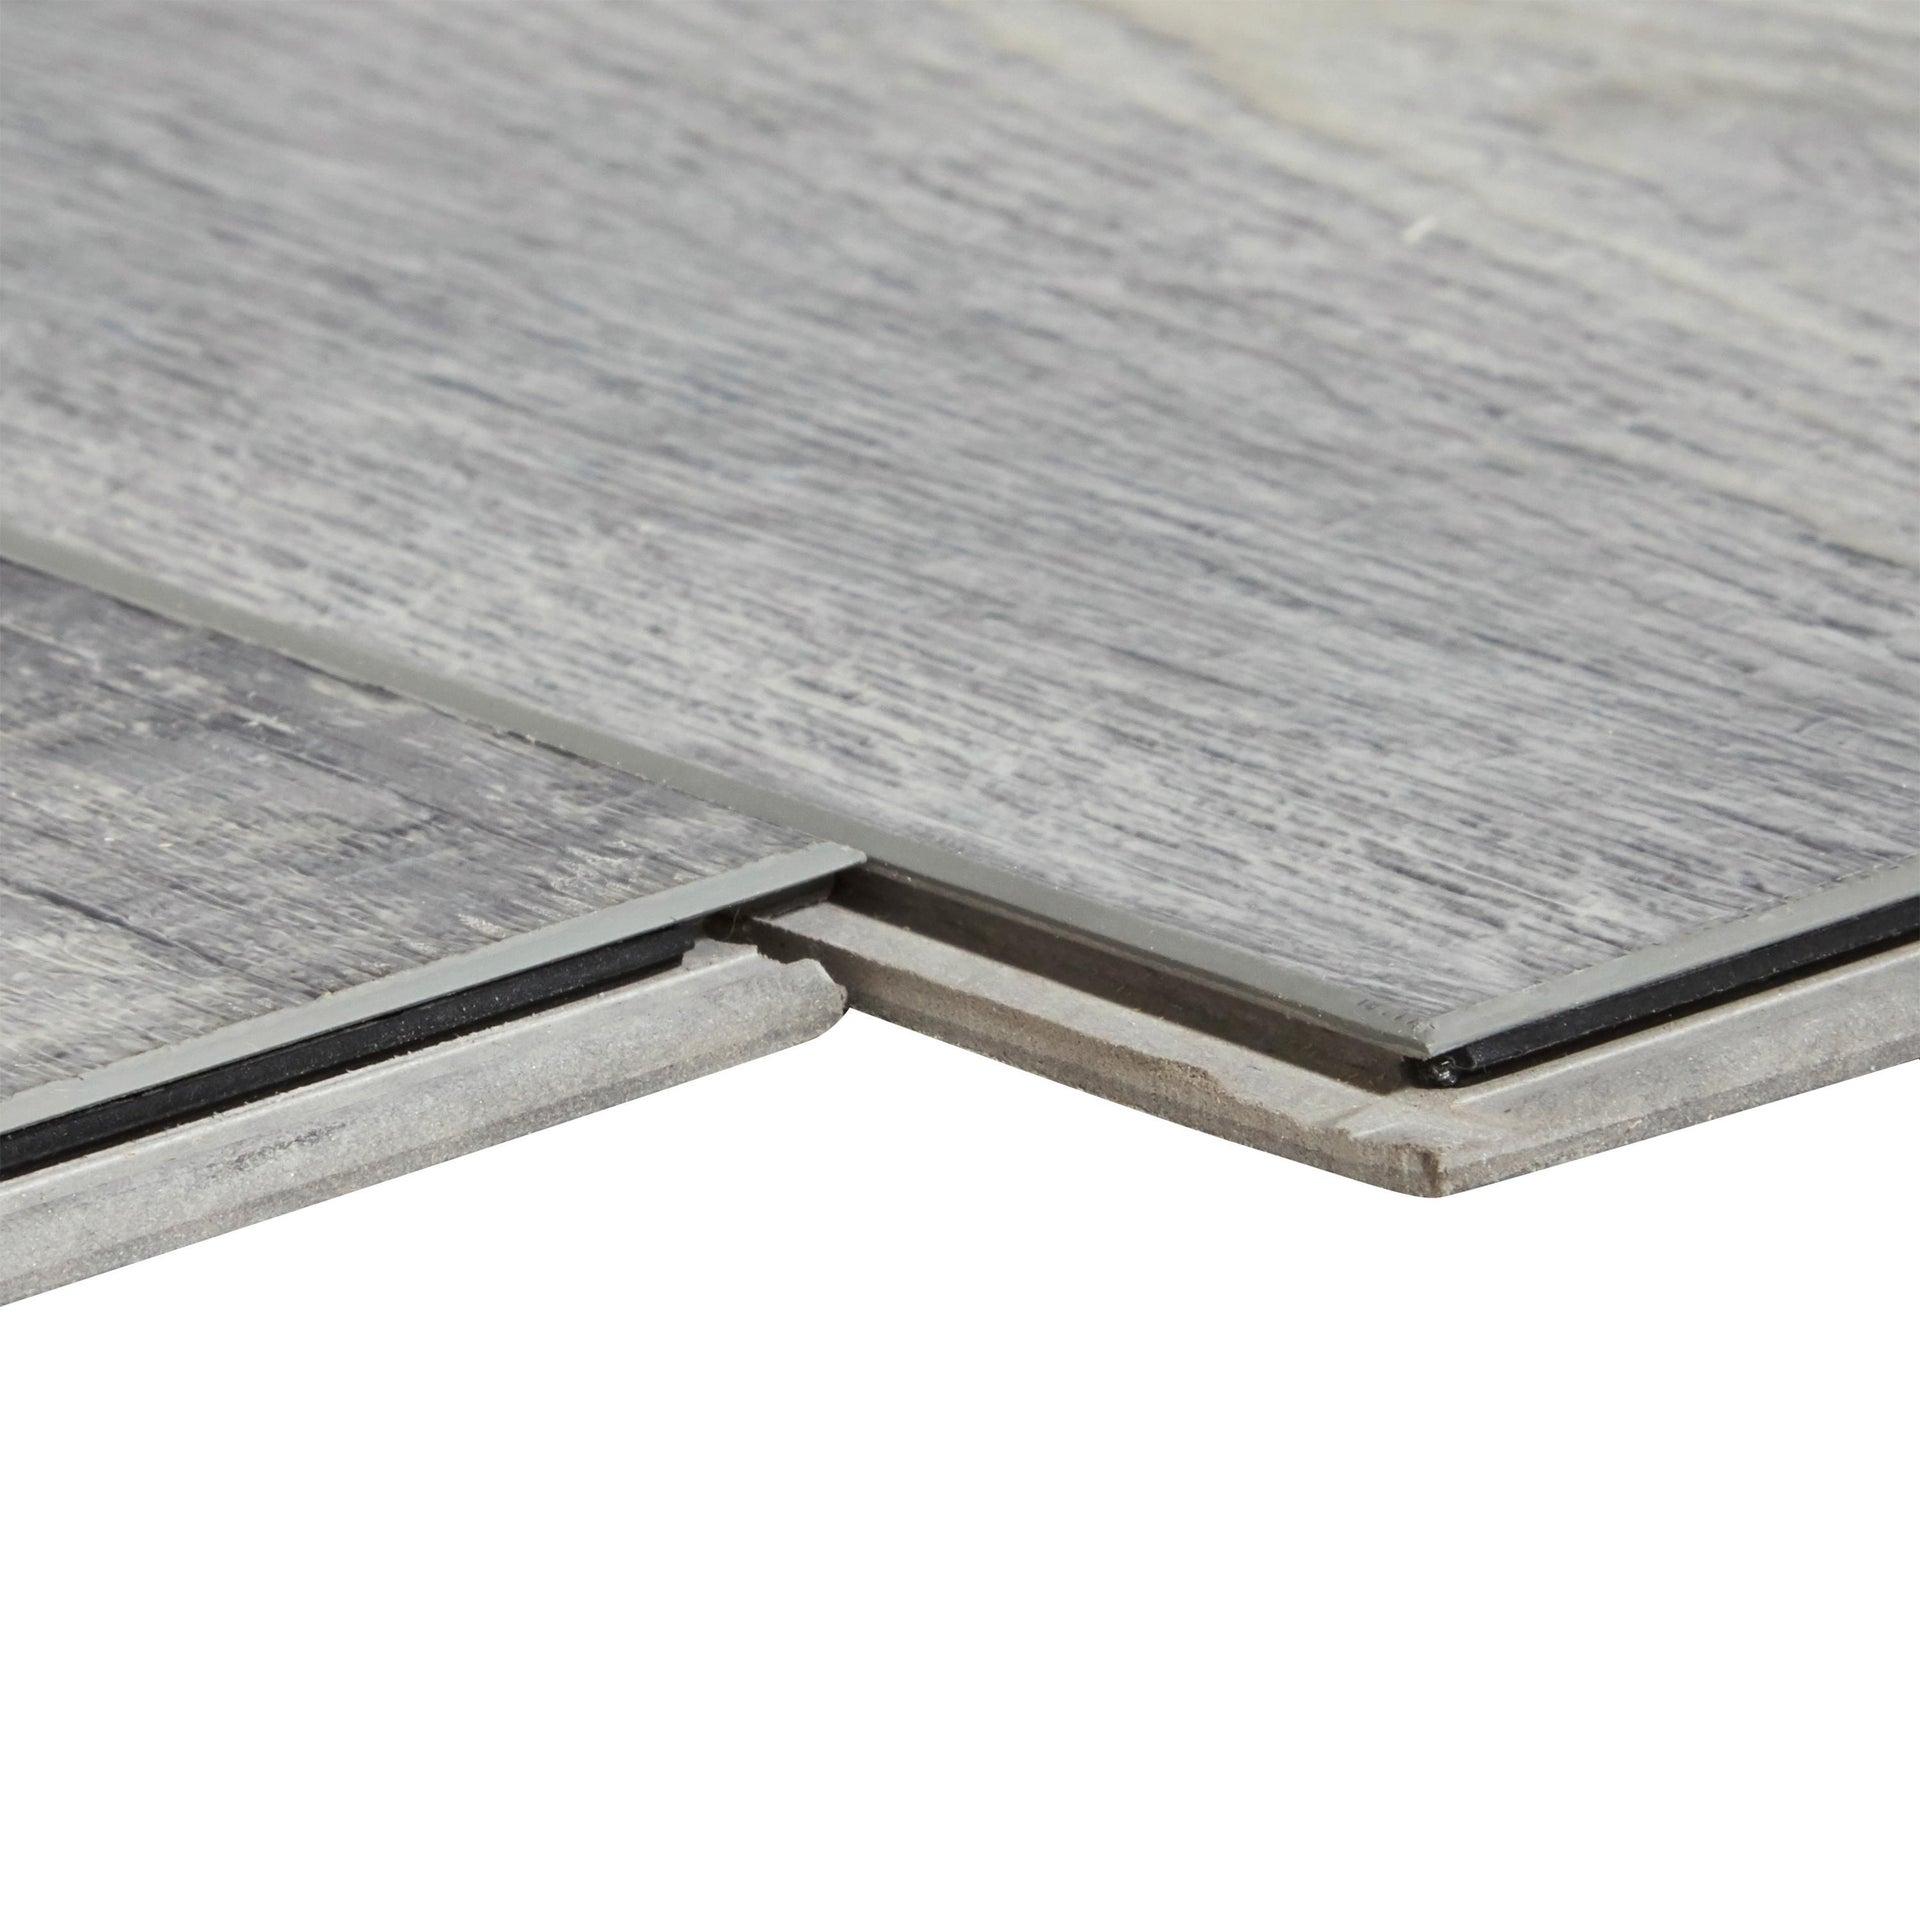 Plancia di vinile flottante clic+ Solor Sp 5 mm grigio / argento - 3